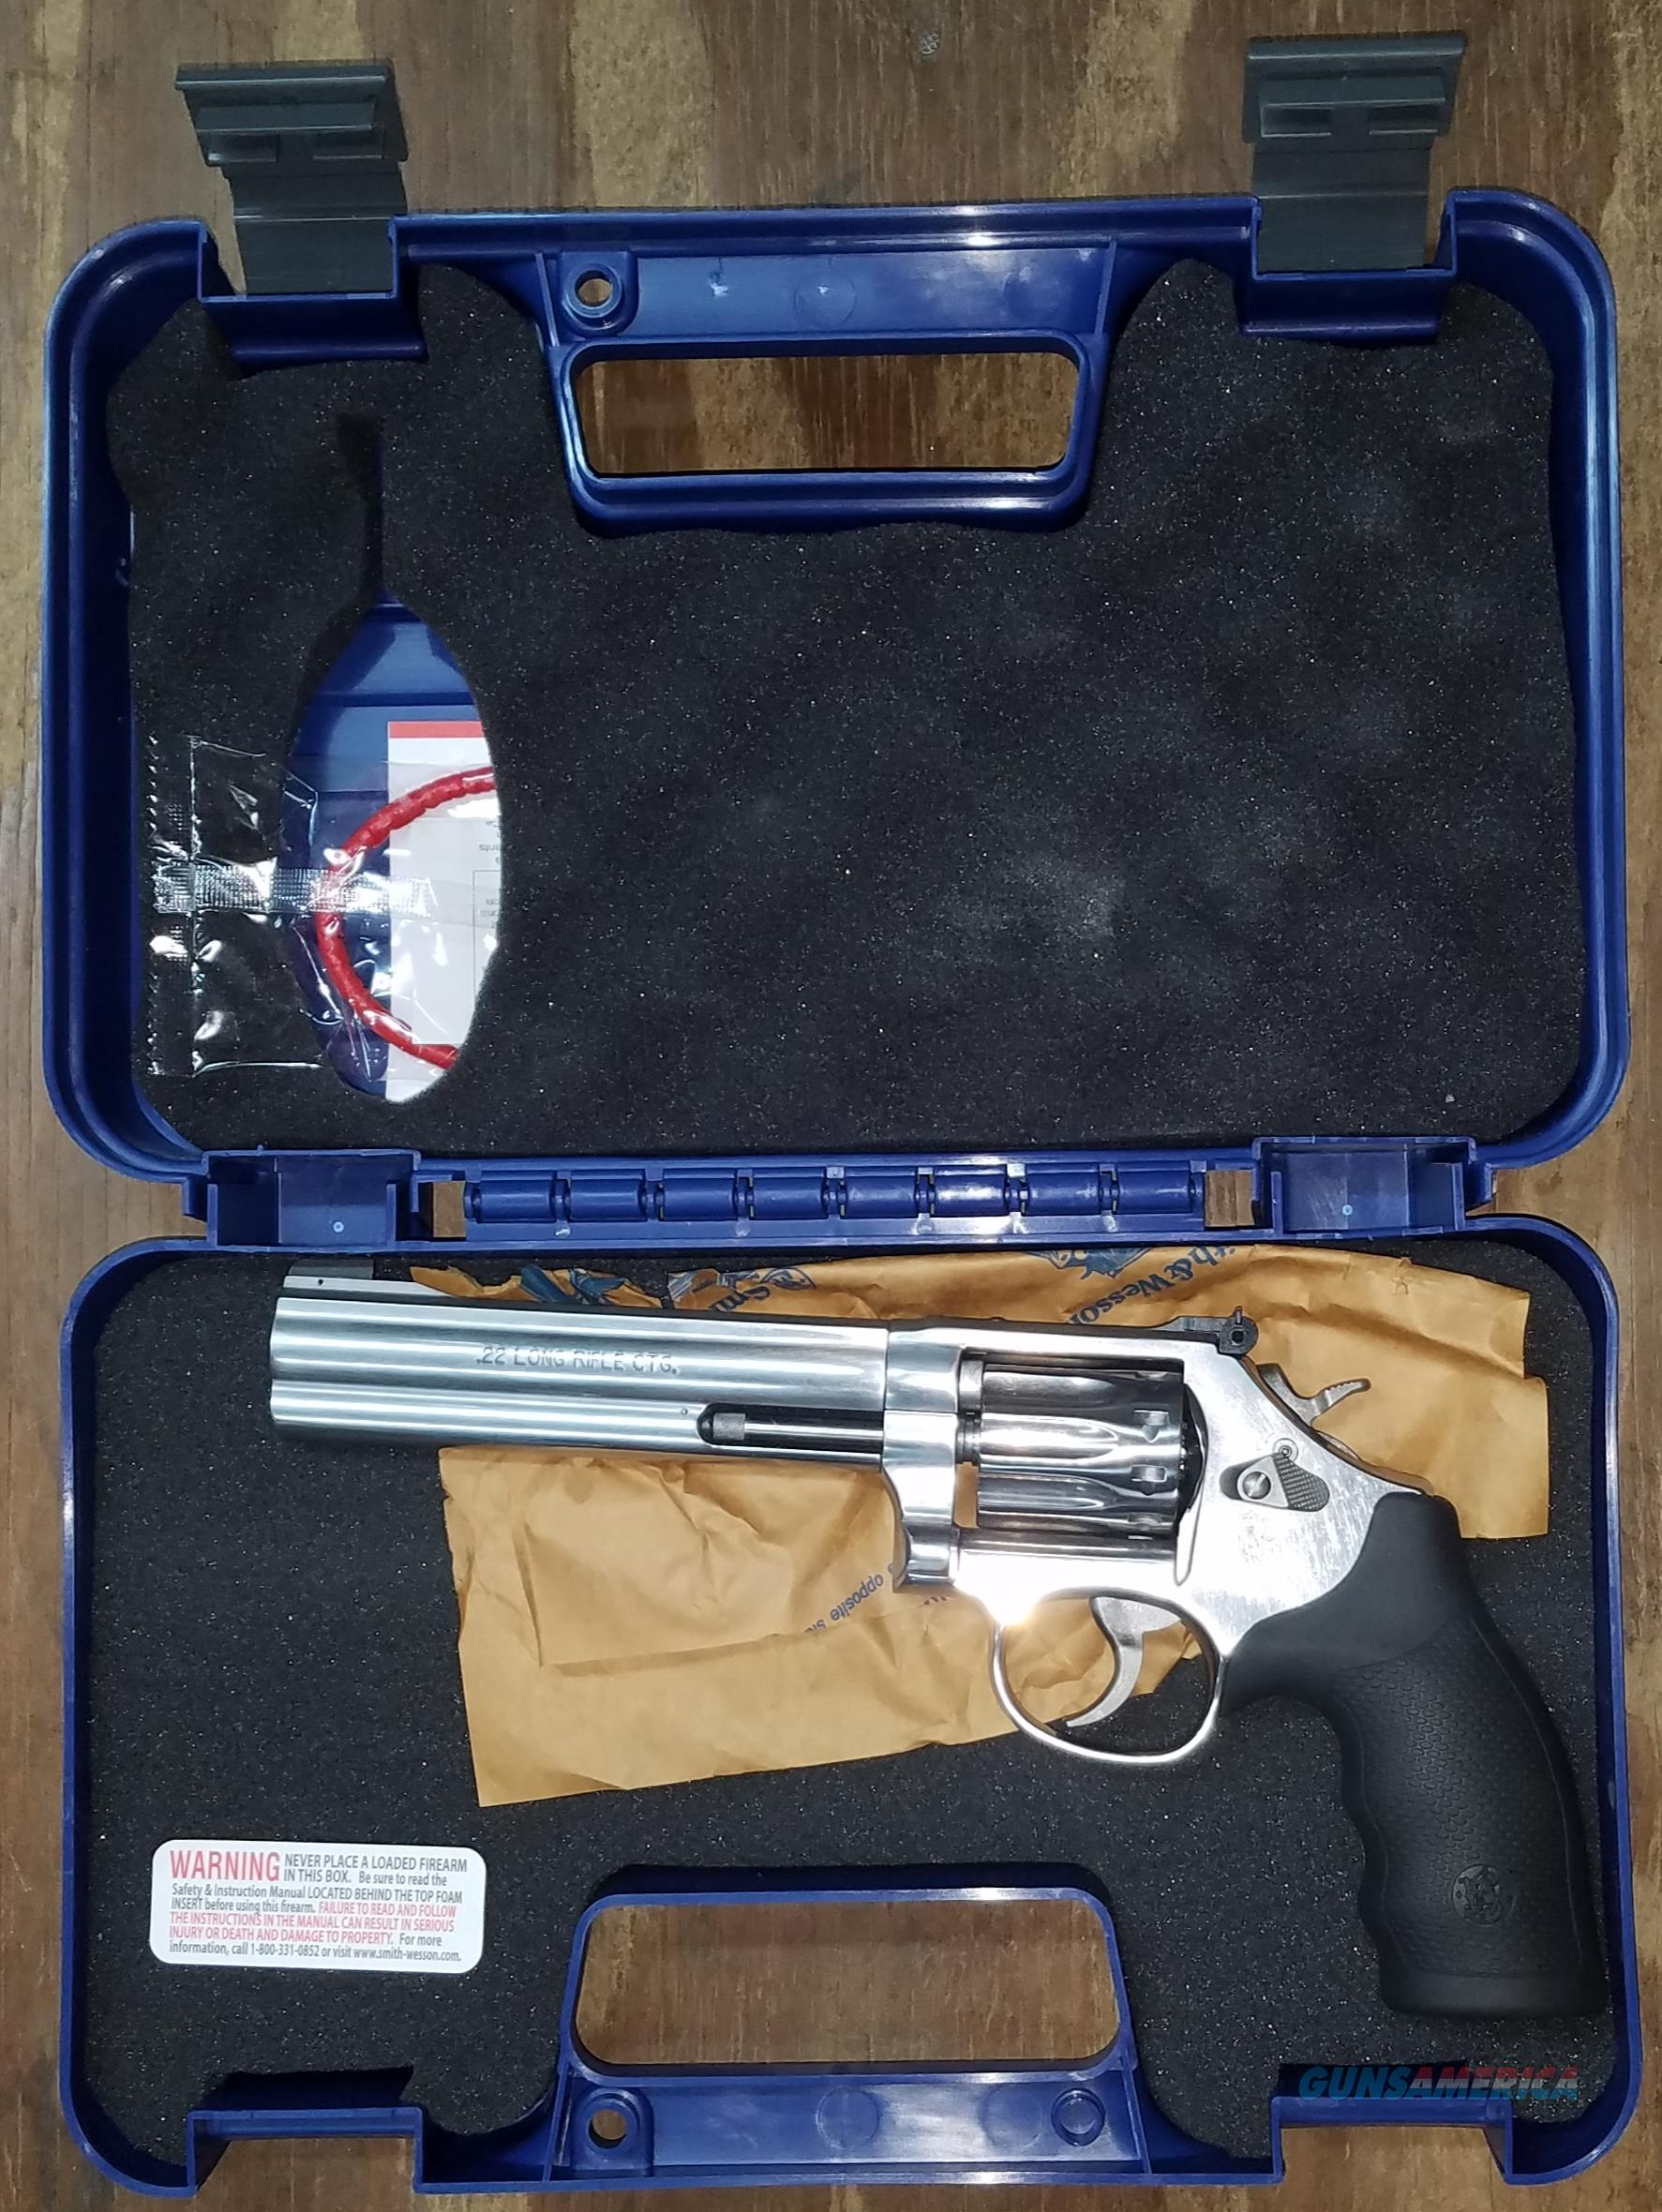 Smith & Wesson Model 617 Revolver 160578 .22 LR  Guns > Pistols > Smith & Wesson Revolvers > Med. Frame ( K/L )